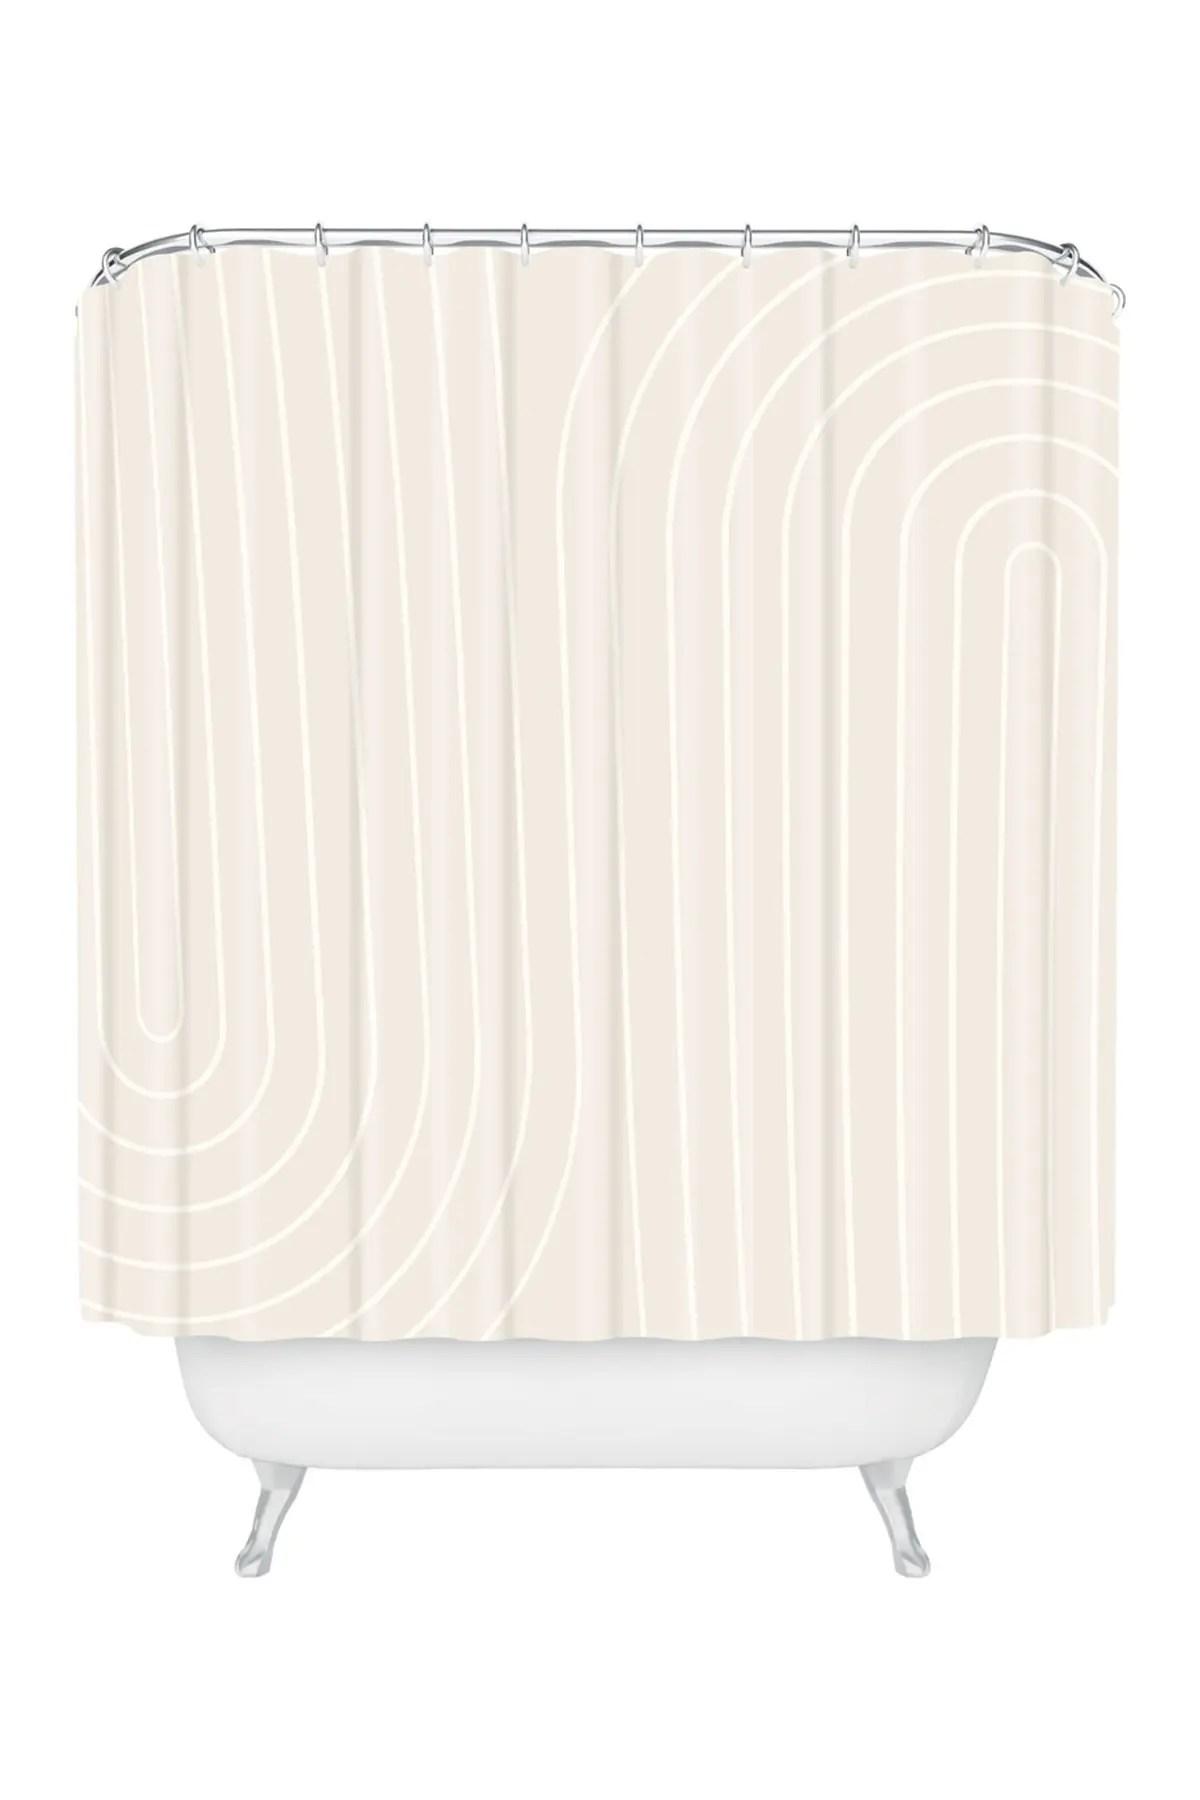 deny designs colour poems minimal line curvature off white shower curtain nordstrom rack